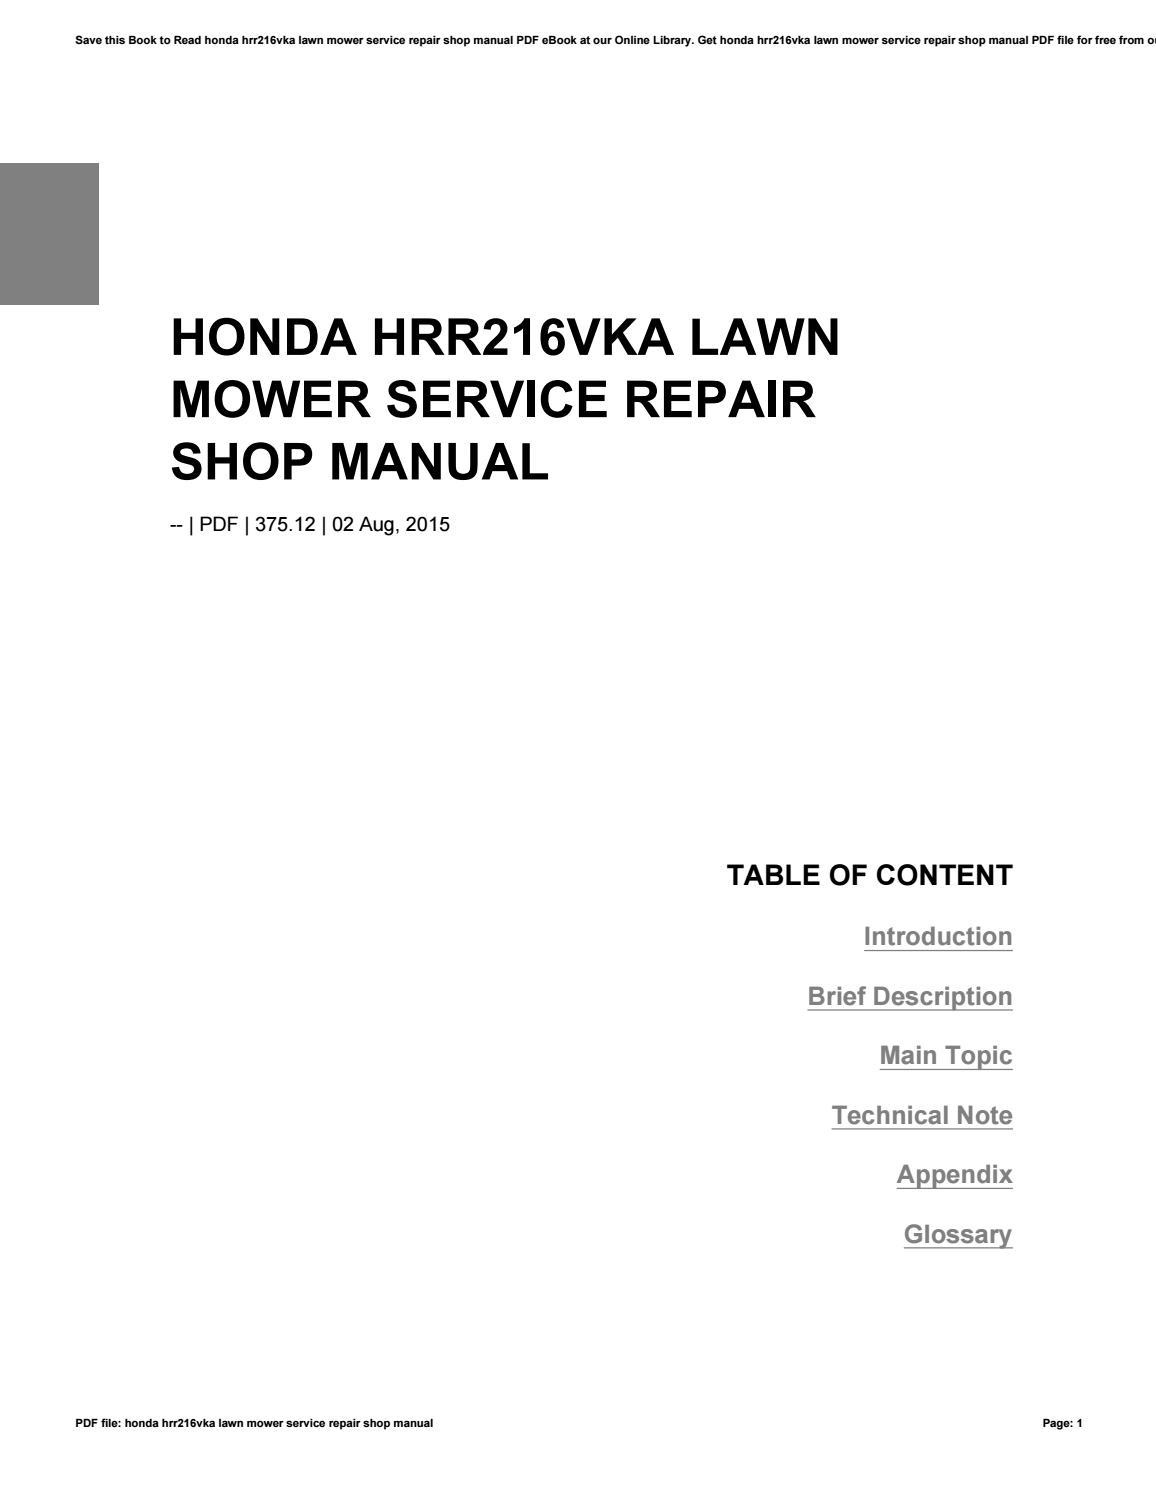 Honda hrr216vka lawn mower service repair shop manual by reddit27 - issuu